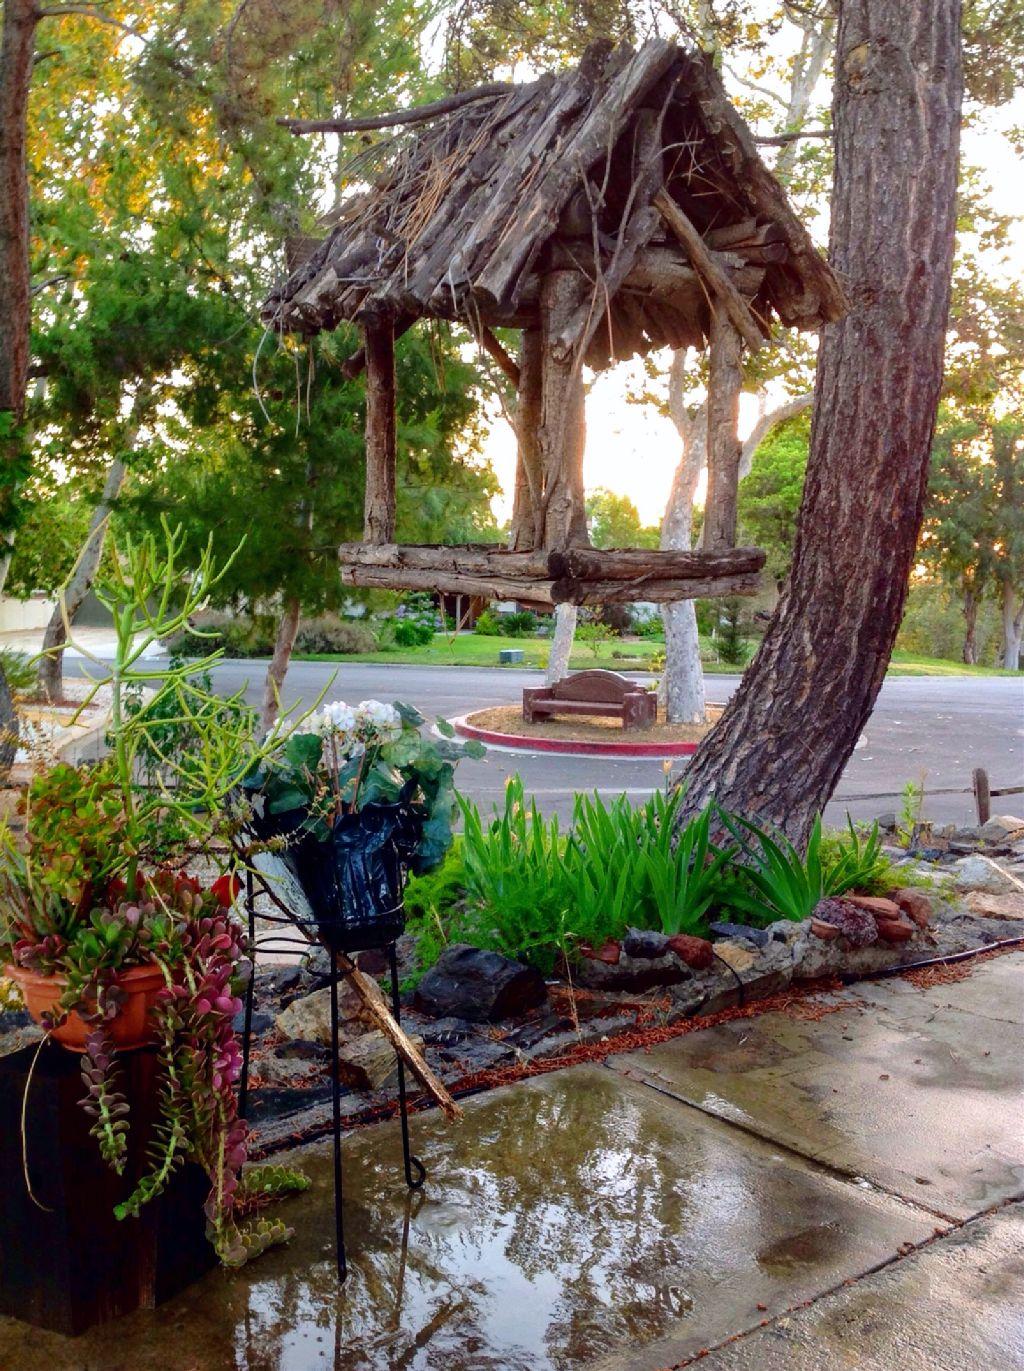 puddle puddles water wet birdhouse house sunset sticks